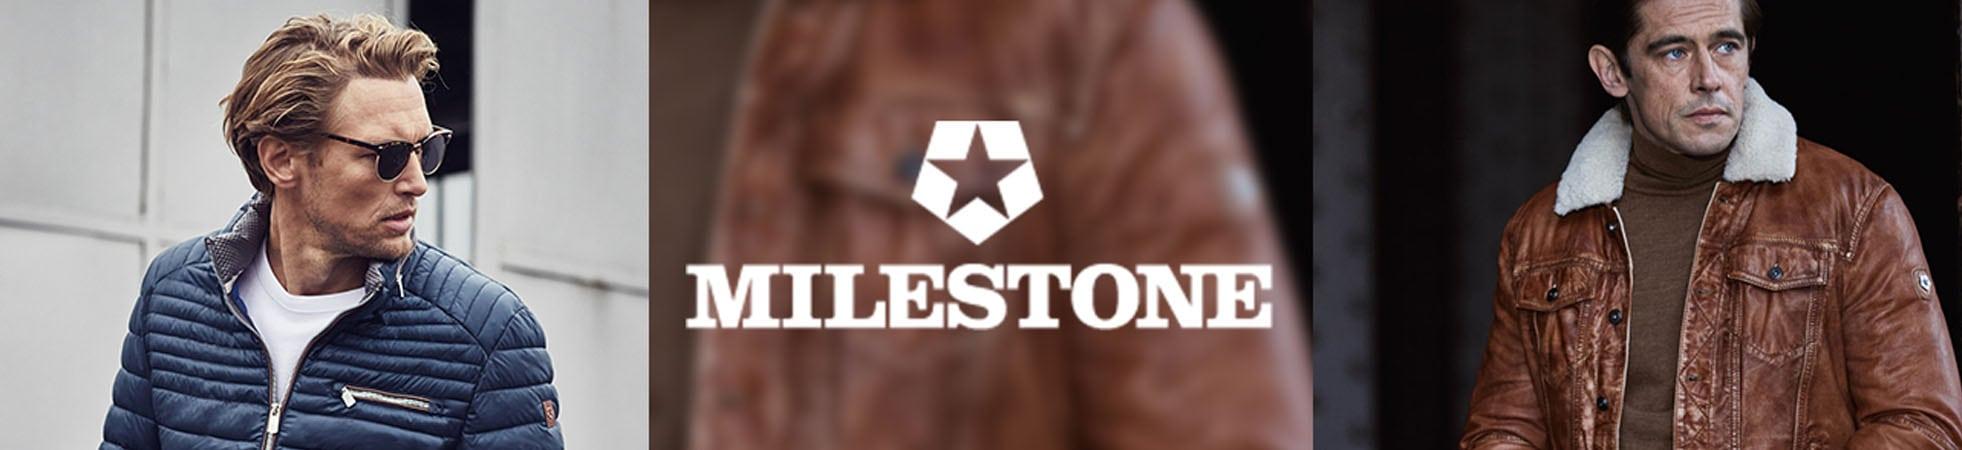 Milestone Herrenjacken